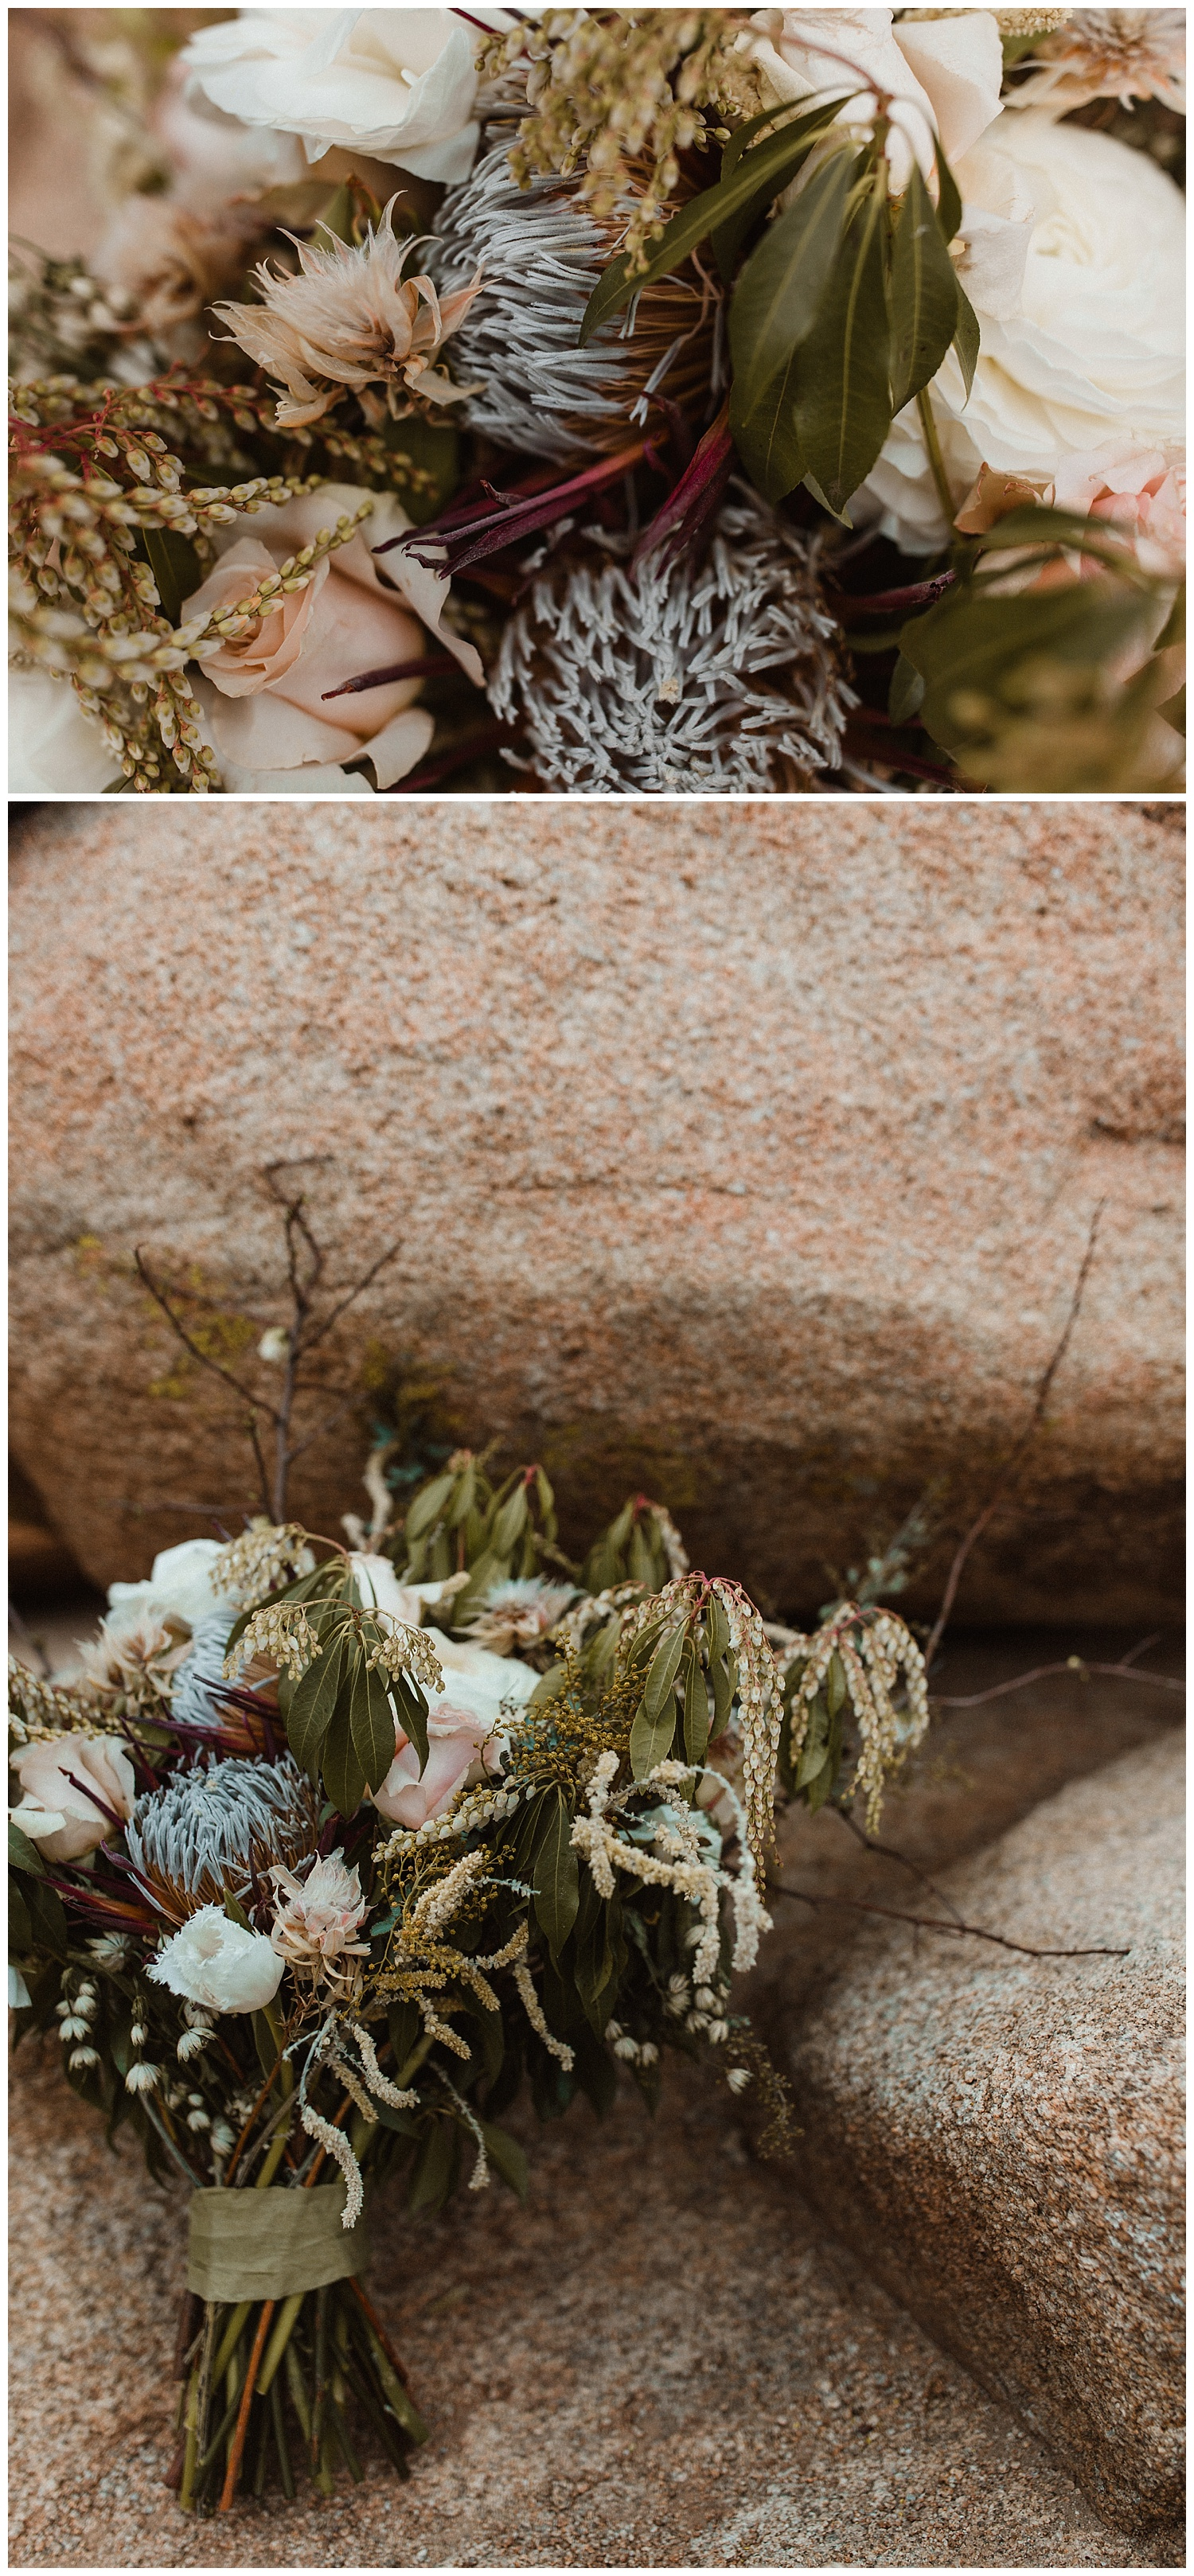 romantic_elopement_joshua_tree_adventurous_wedding_photographer_romantic_intimate_wedding_0005.jpg